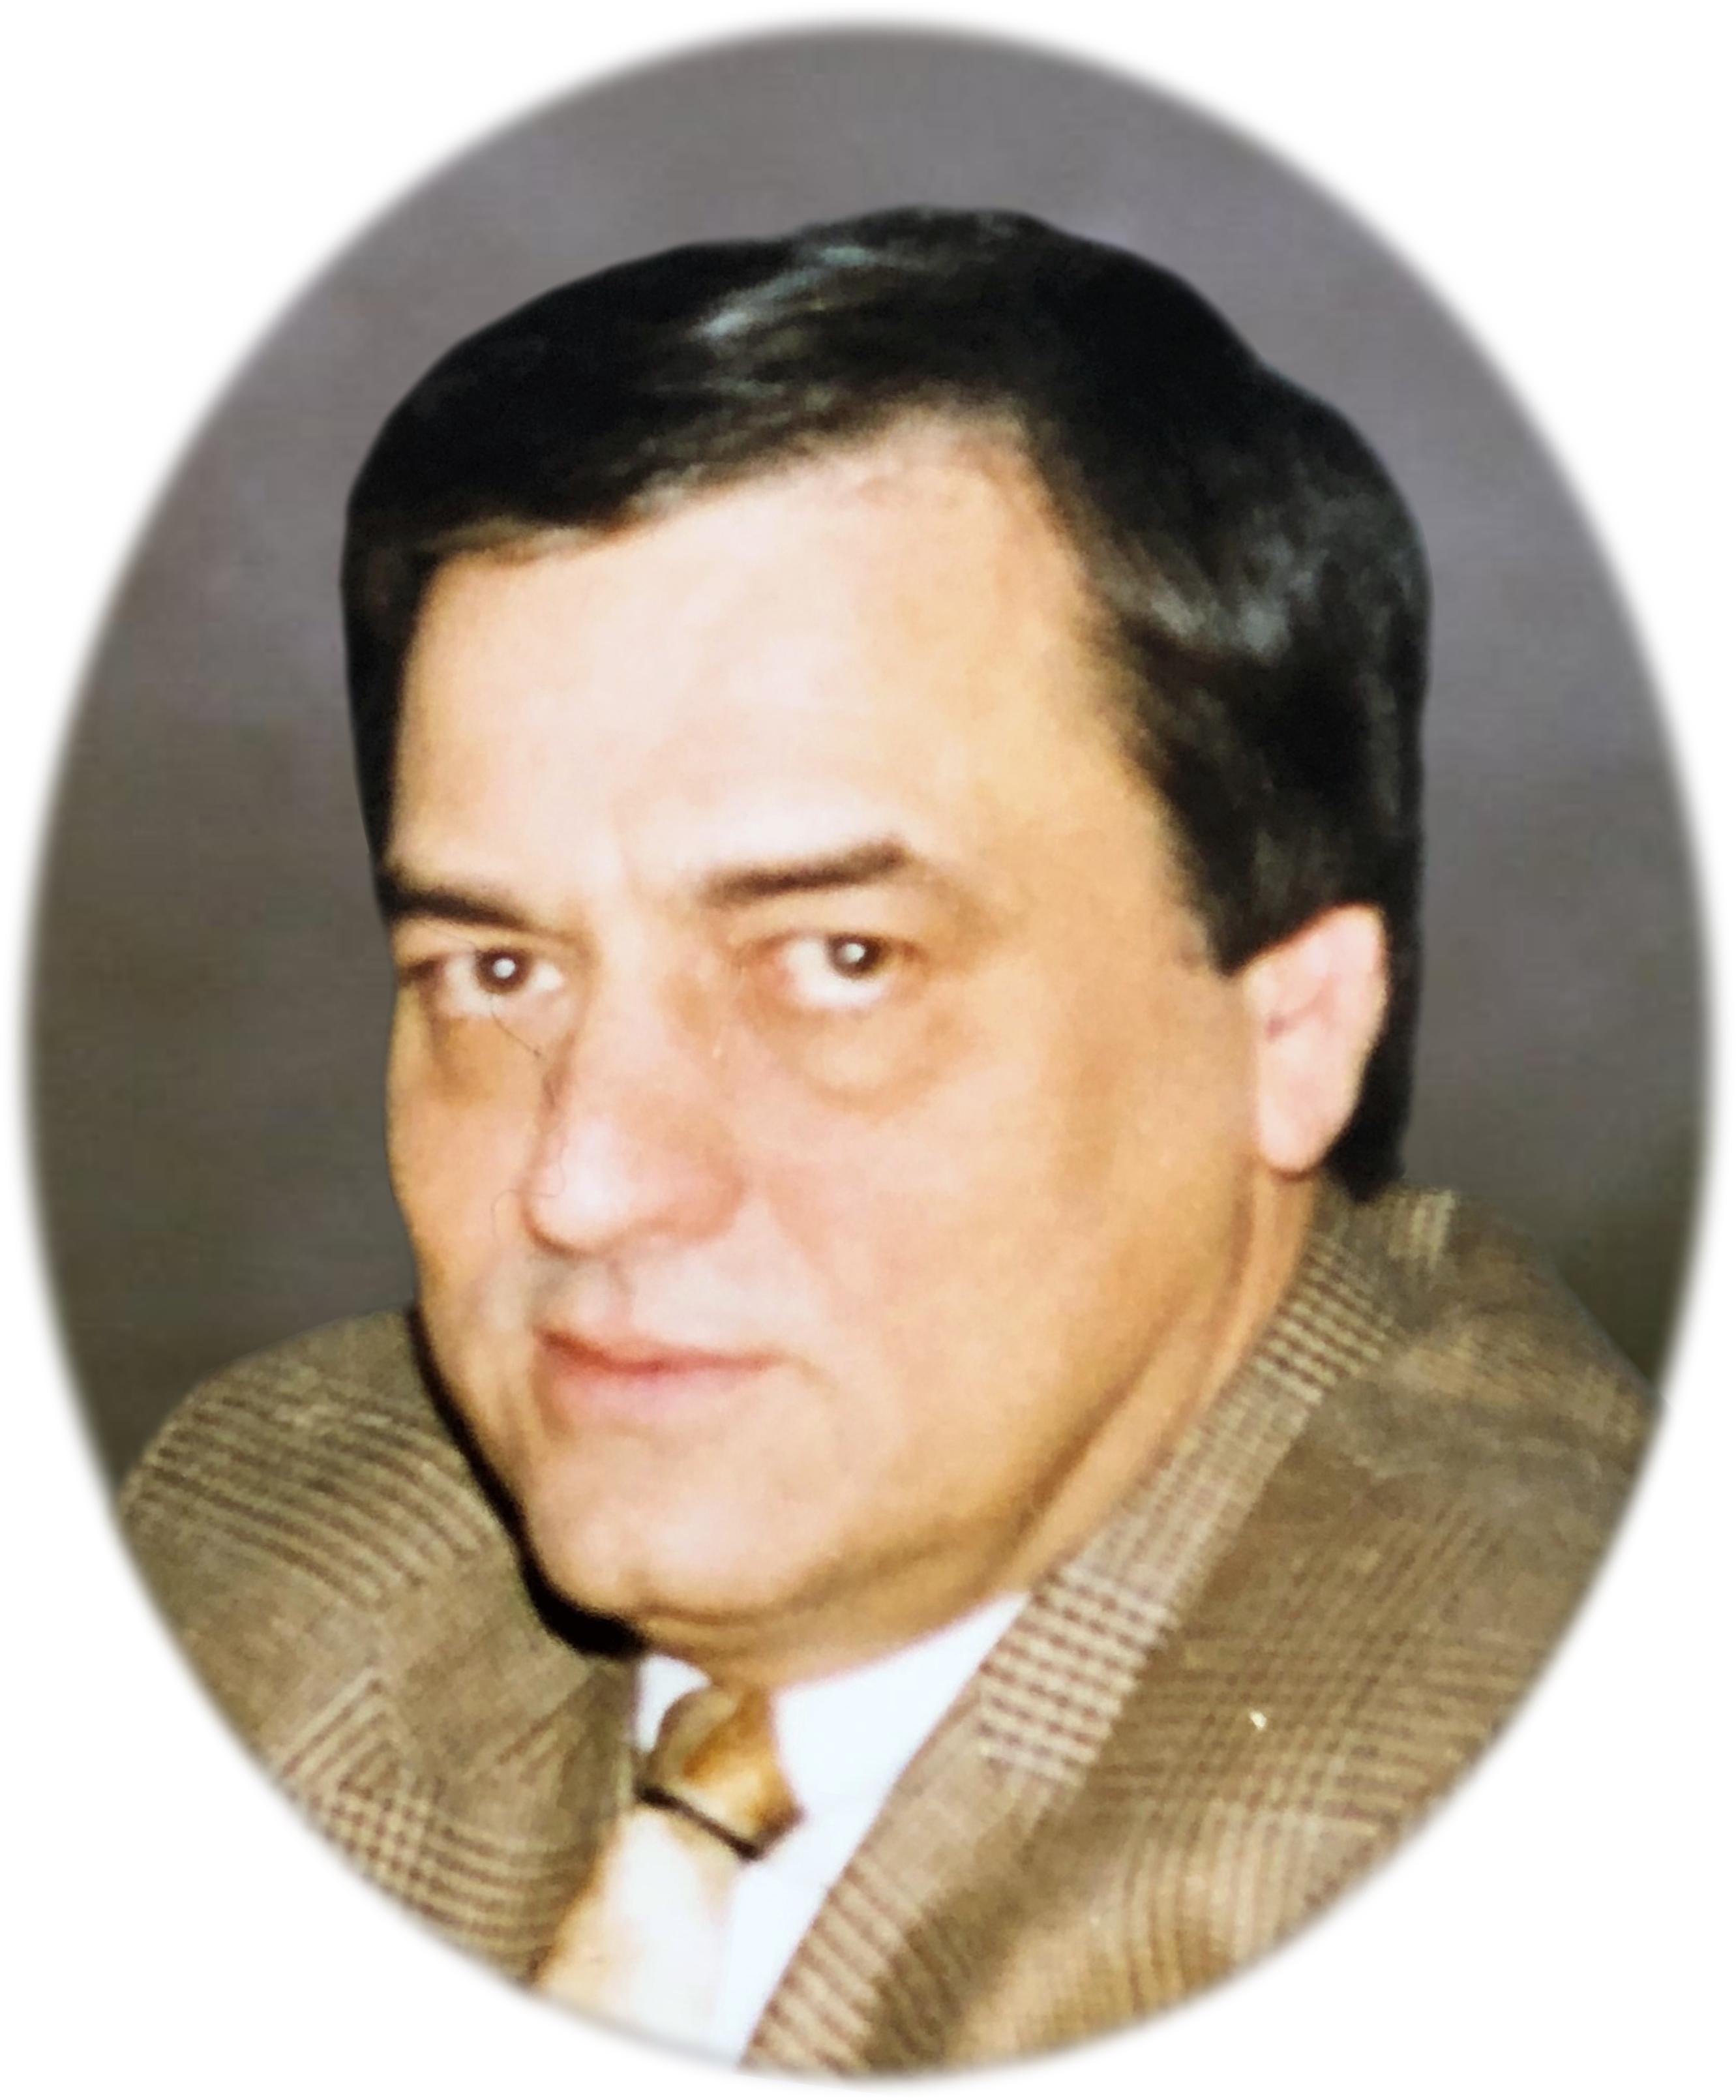 Edward C. Zuroske